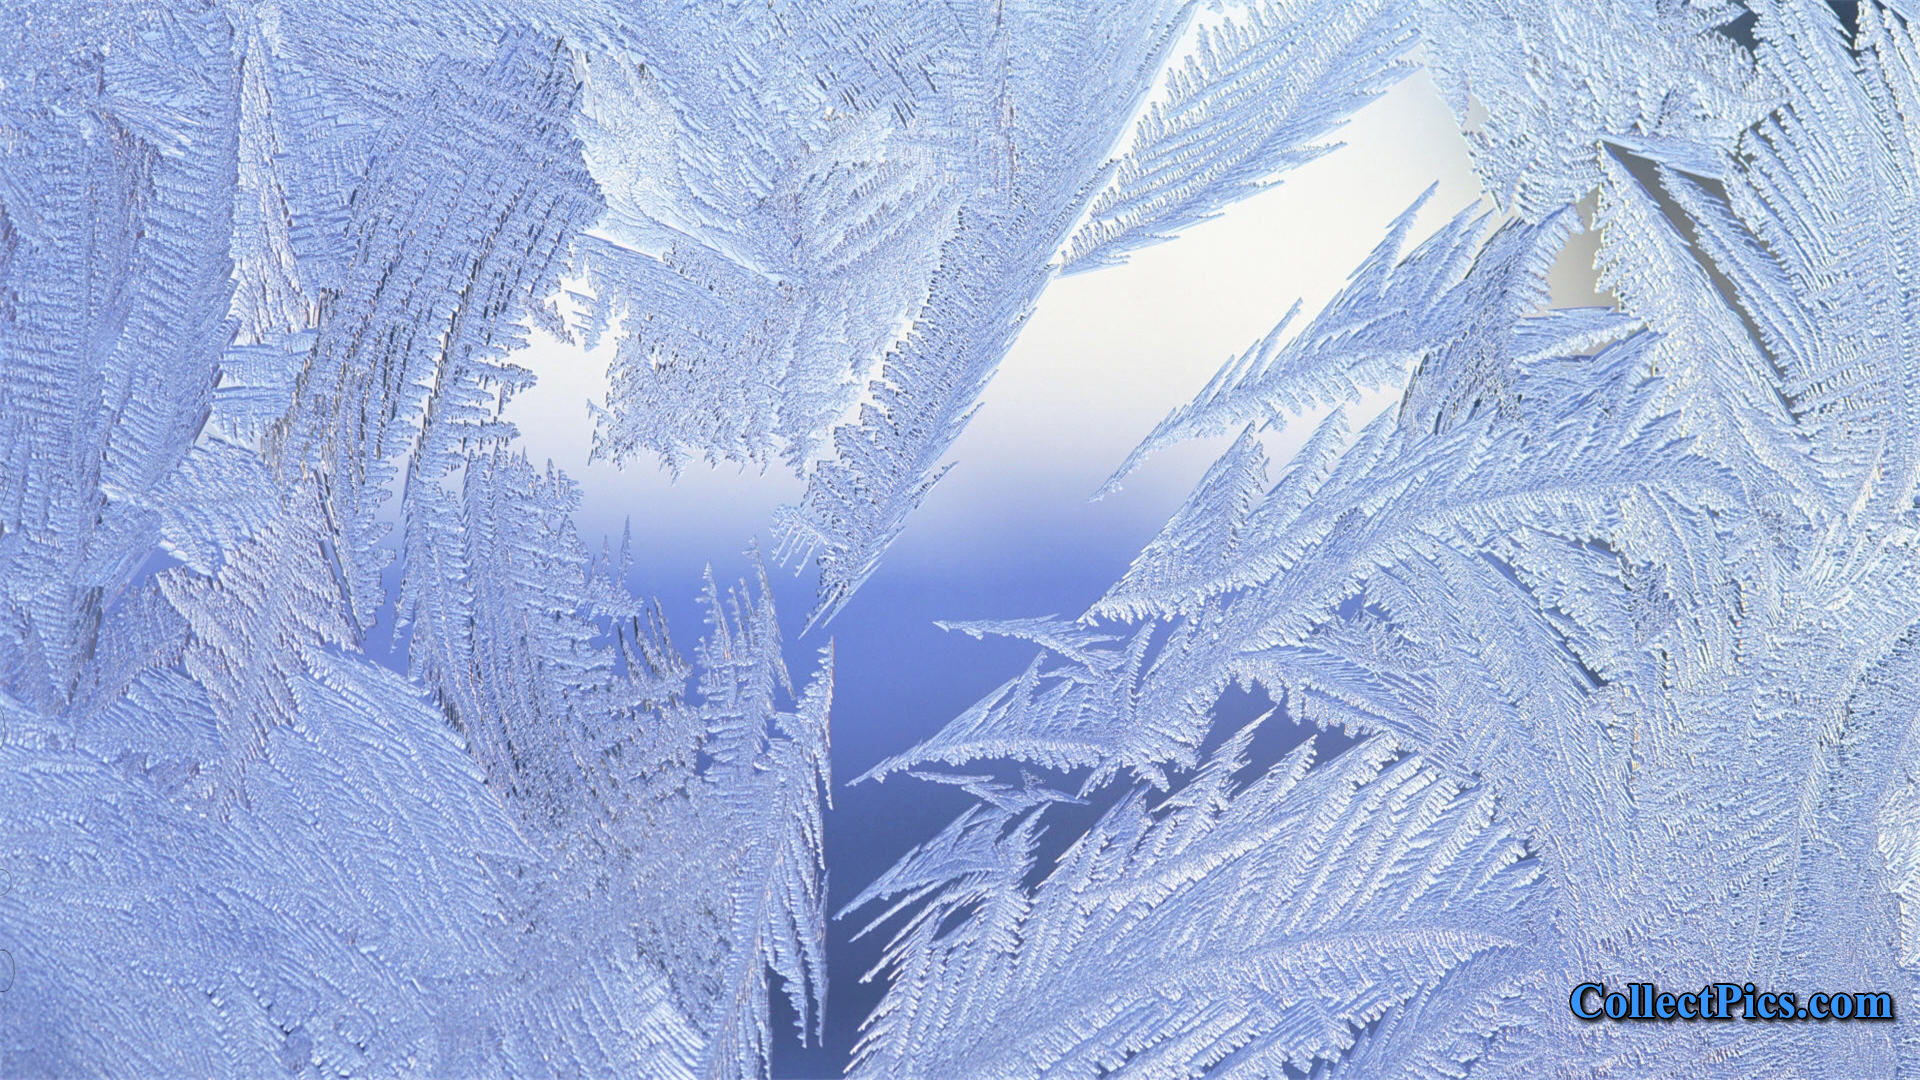 Desktop Winter Backgrounds Wallpaper HD 1920x1080 5866 1920x1080